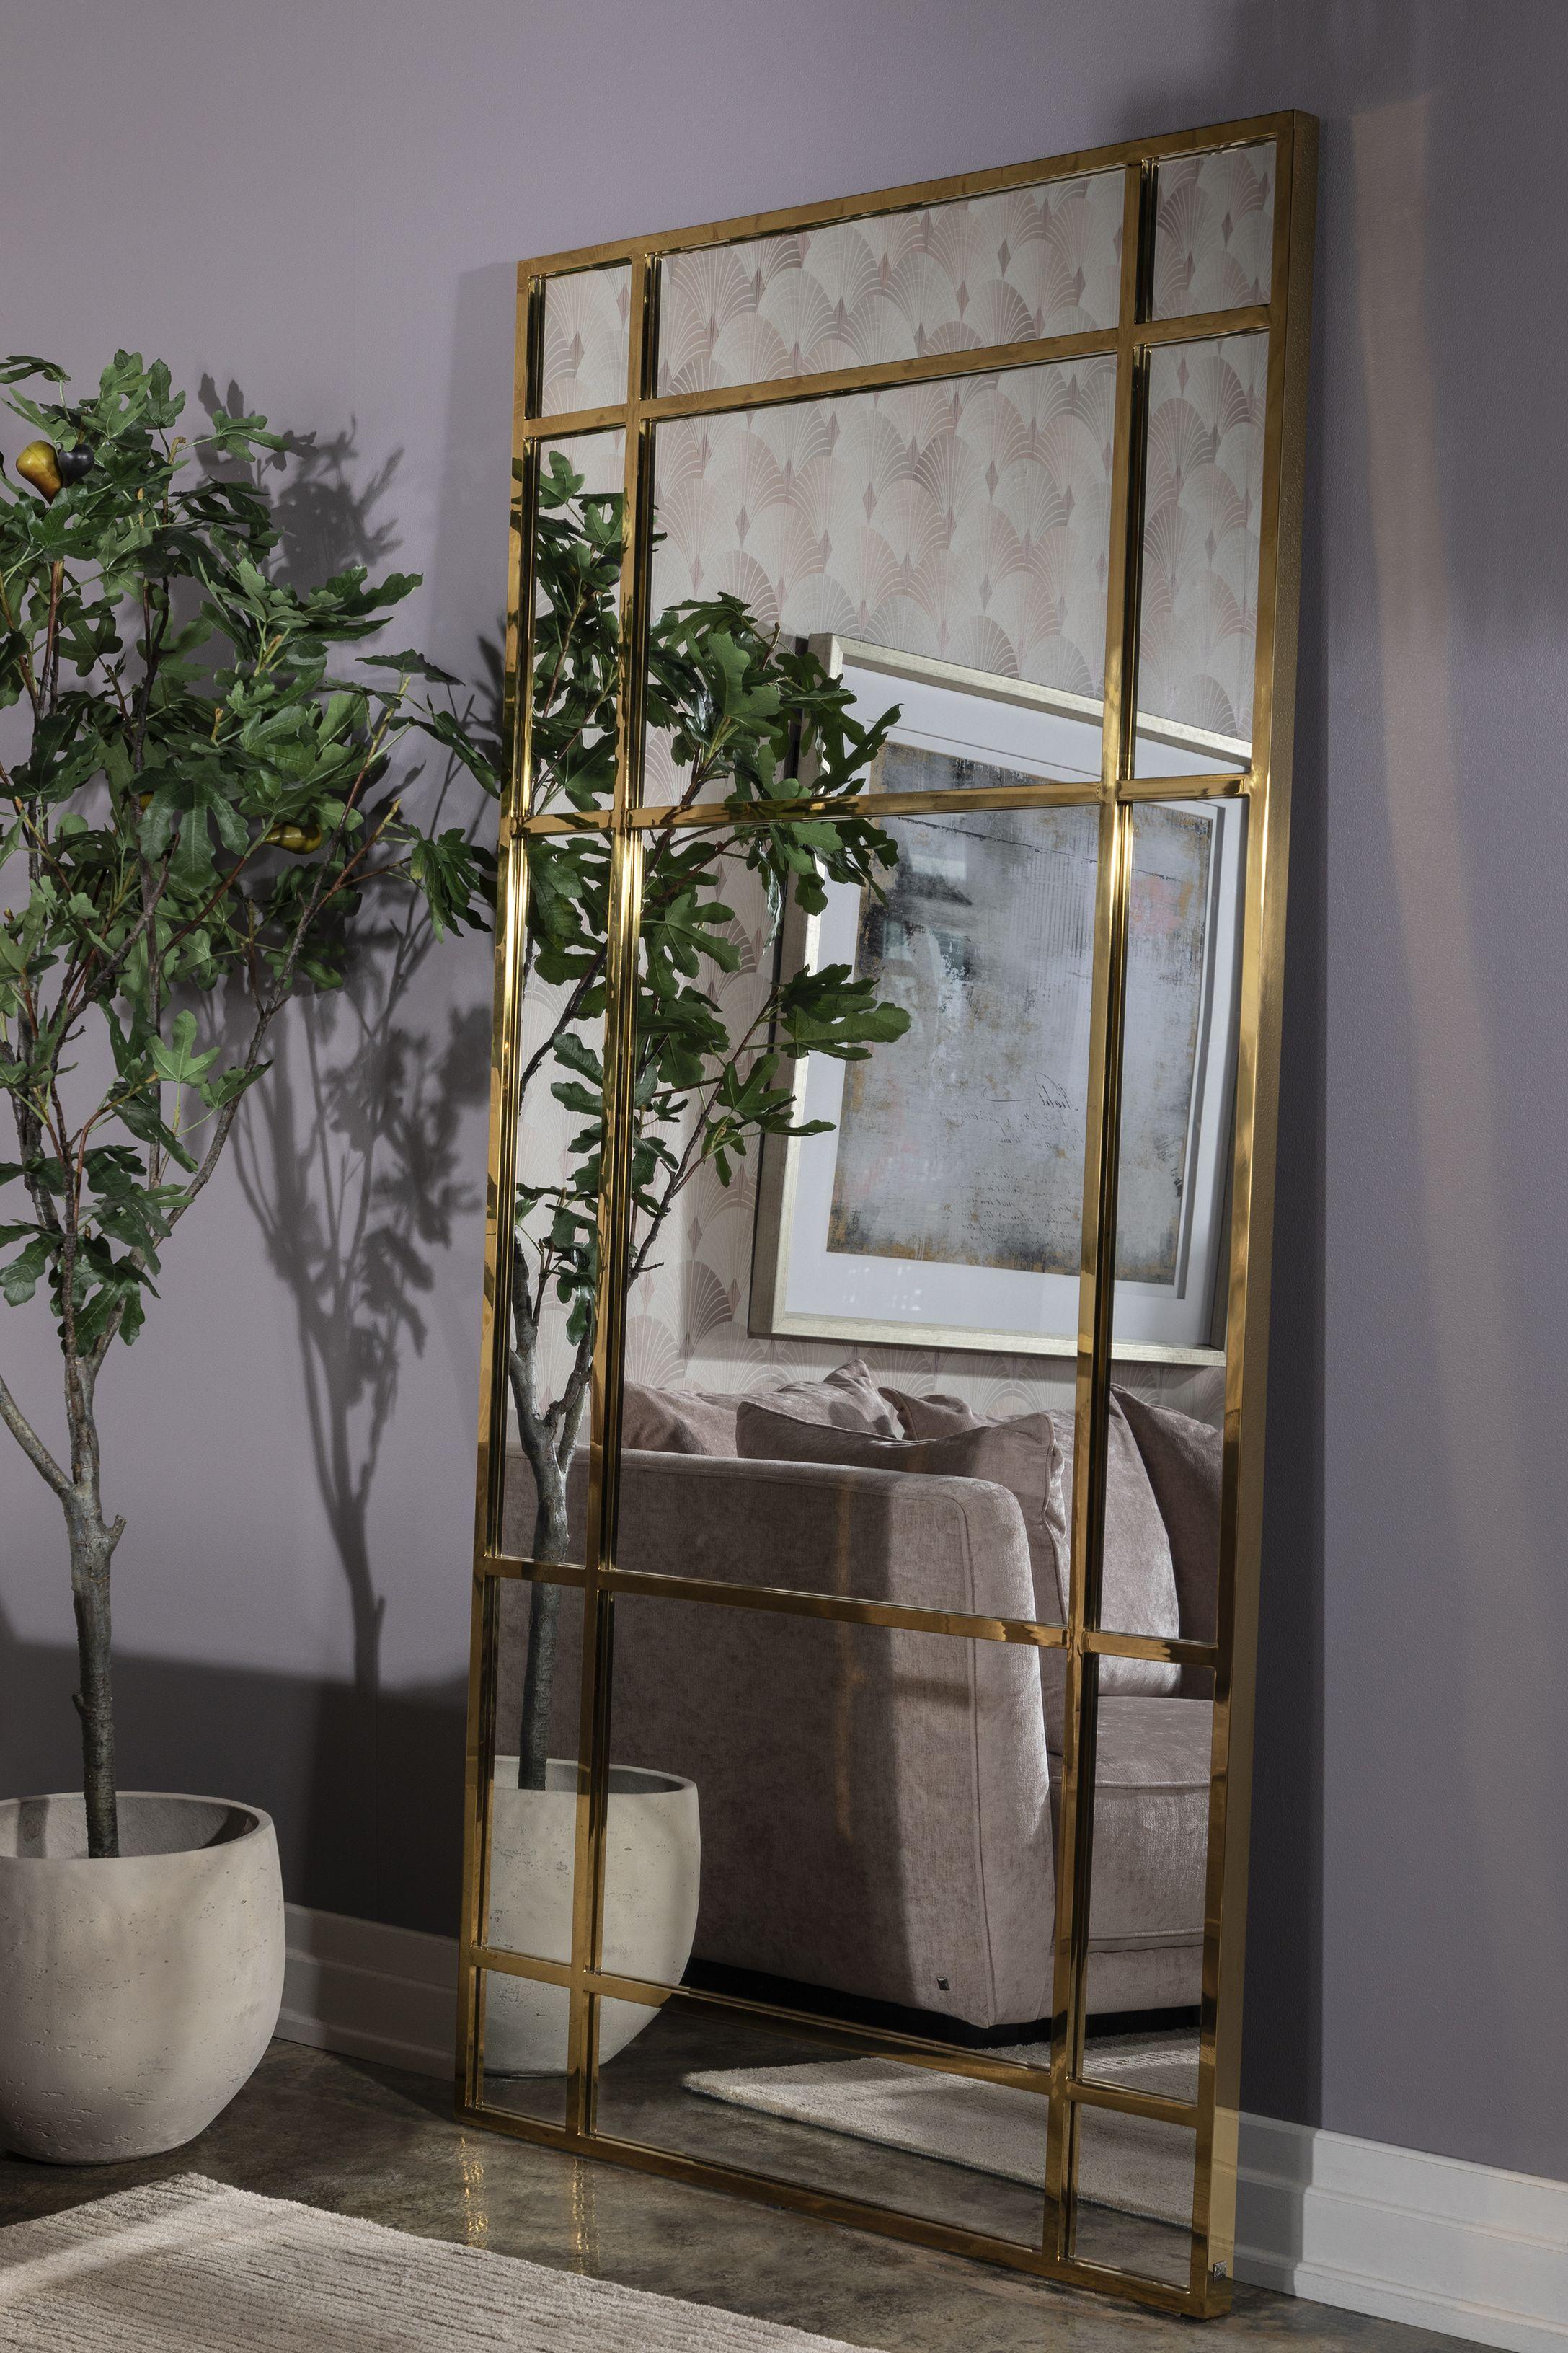 Fusion I Decor In 2020 Mirror Decor Living Room Living Room Mirrors Standing Mirror #standing #mirror #in #living #room